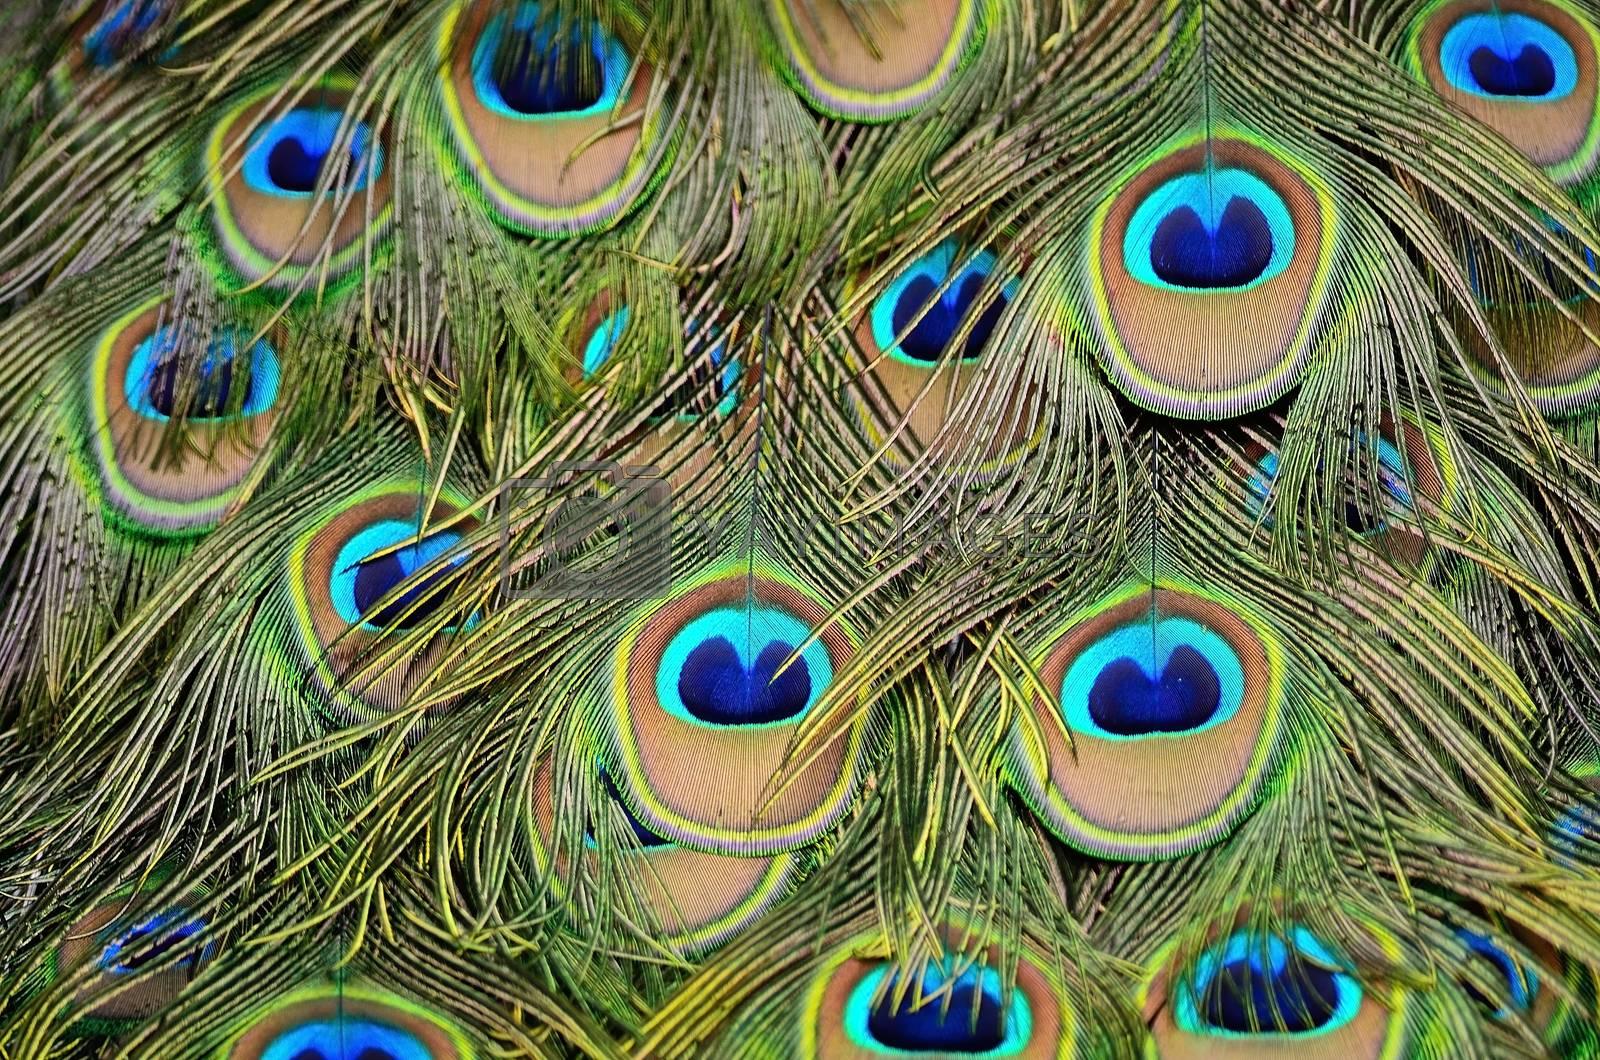 male Green Peacock feathers by panuruangjan